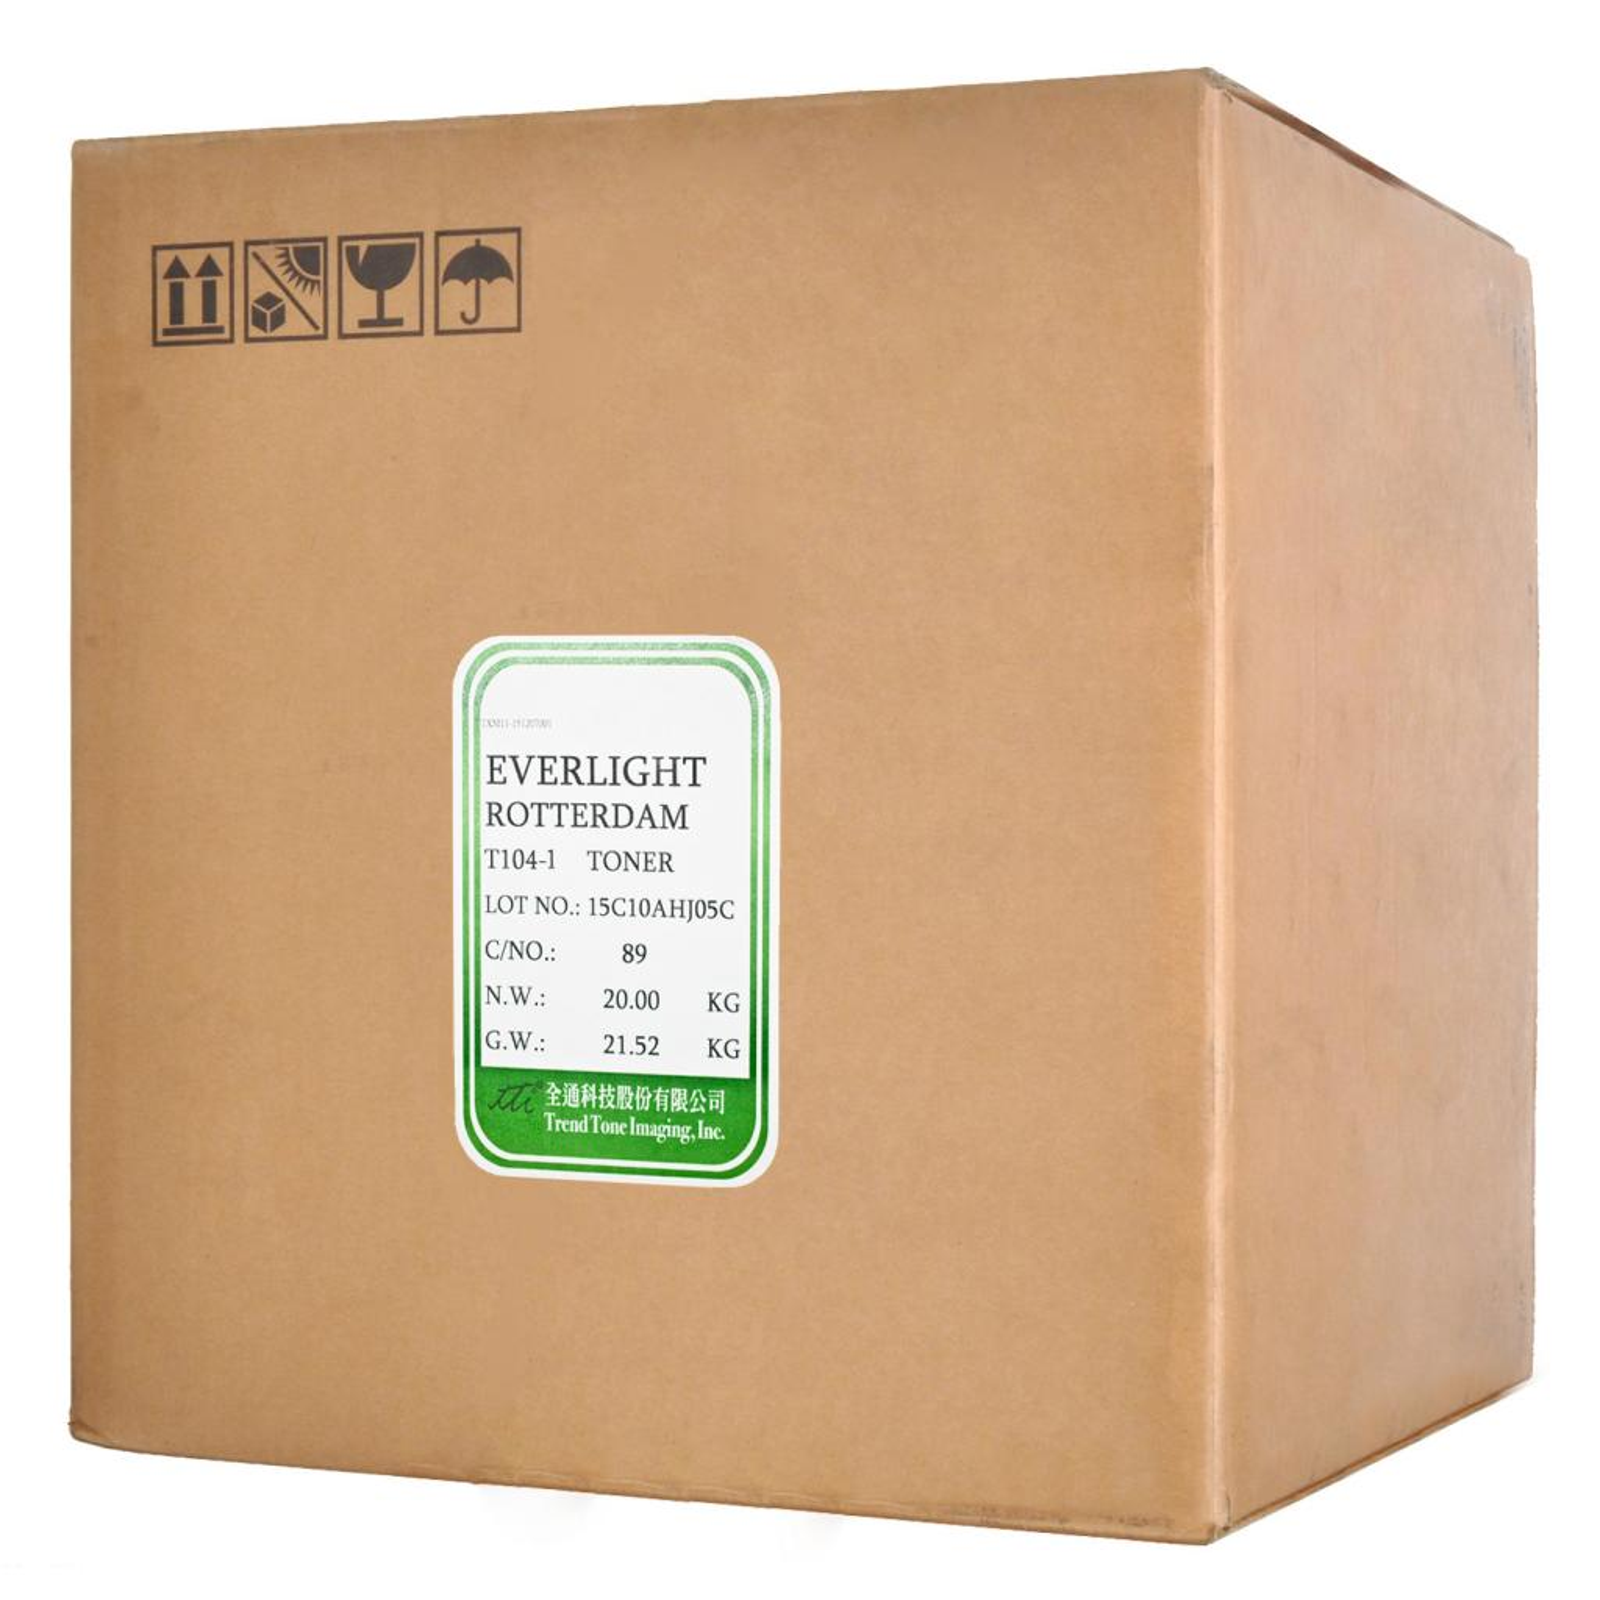 Тонер HP LJ1100/5L (2x10 кг) TTI (T104-1-20)